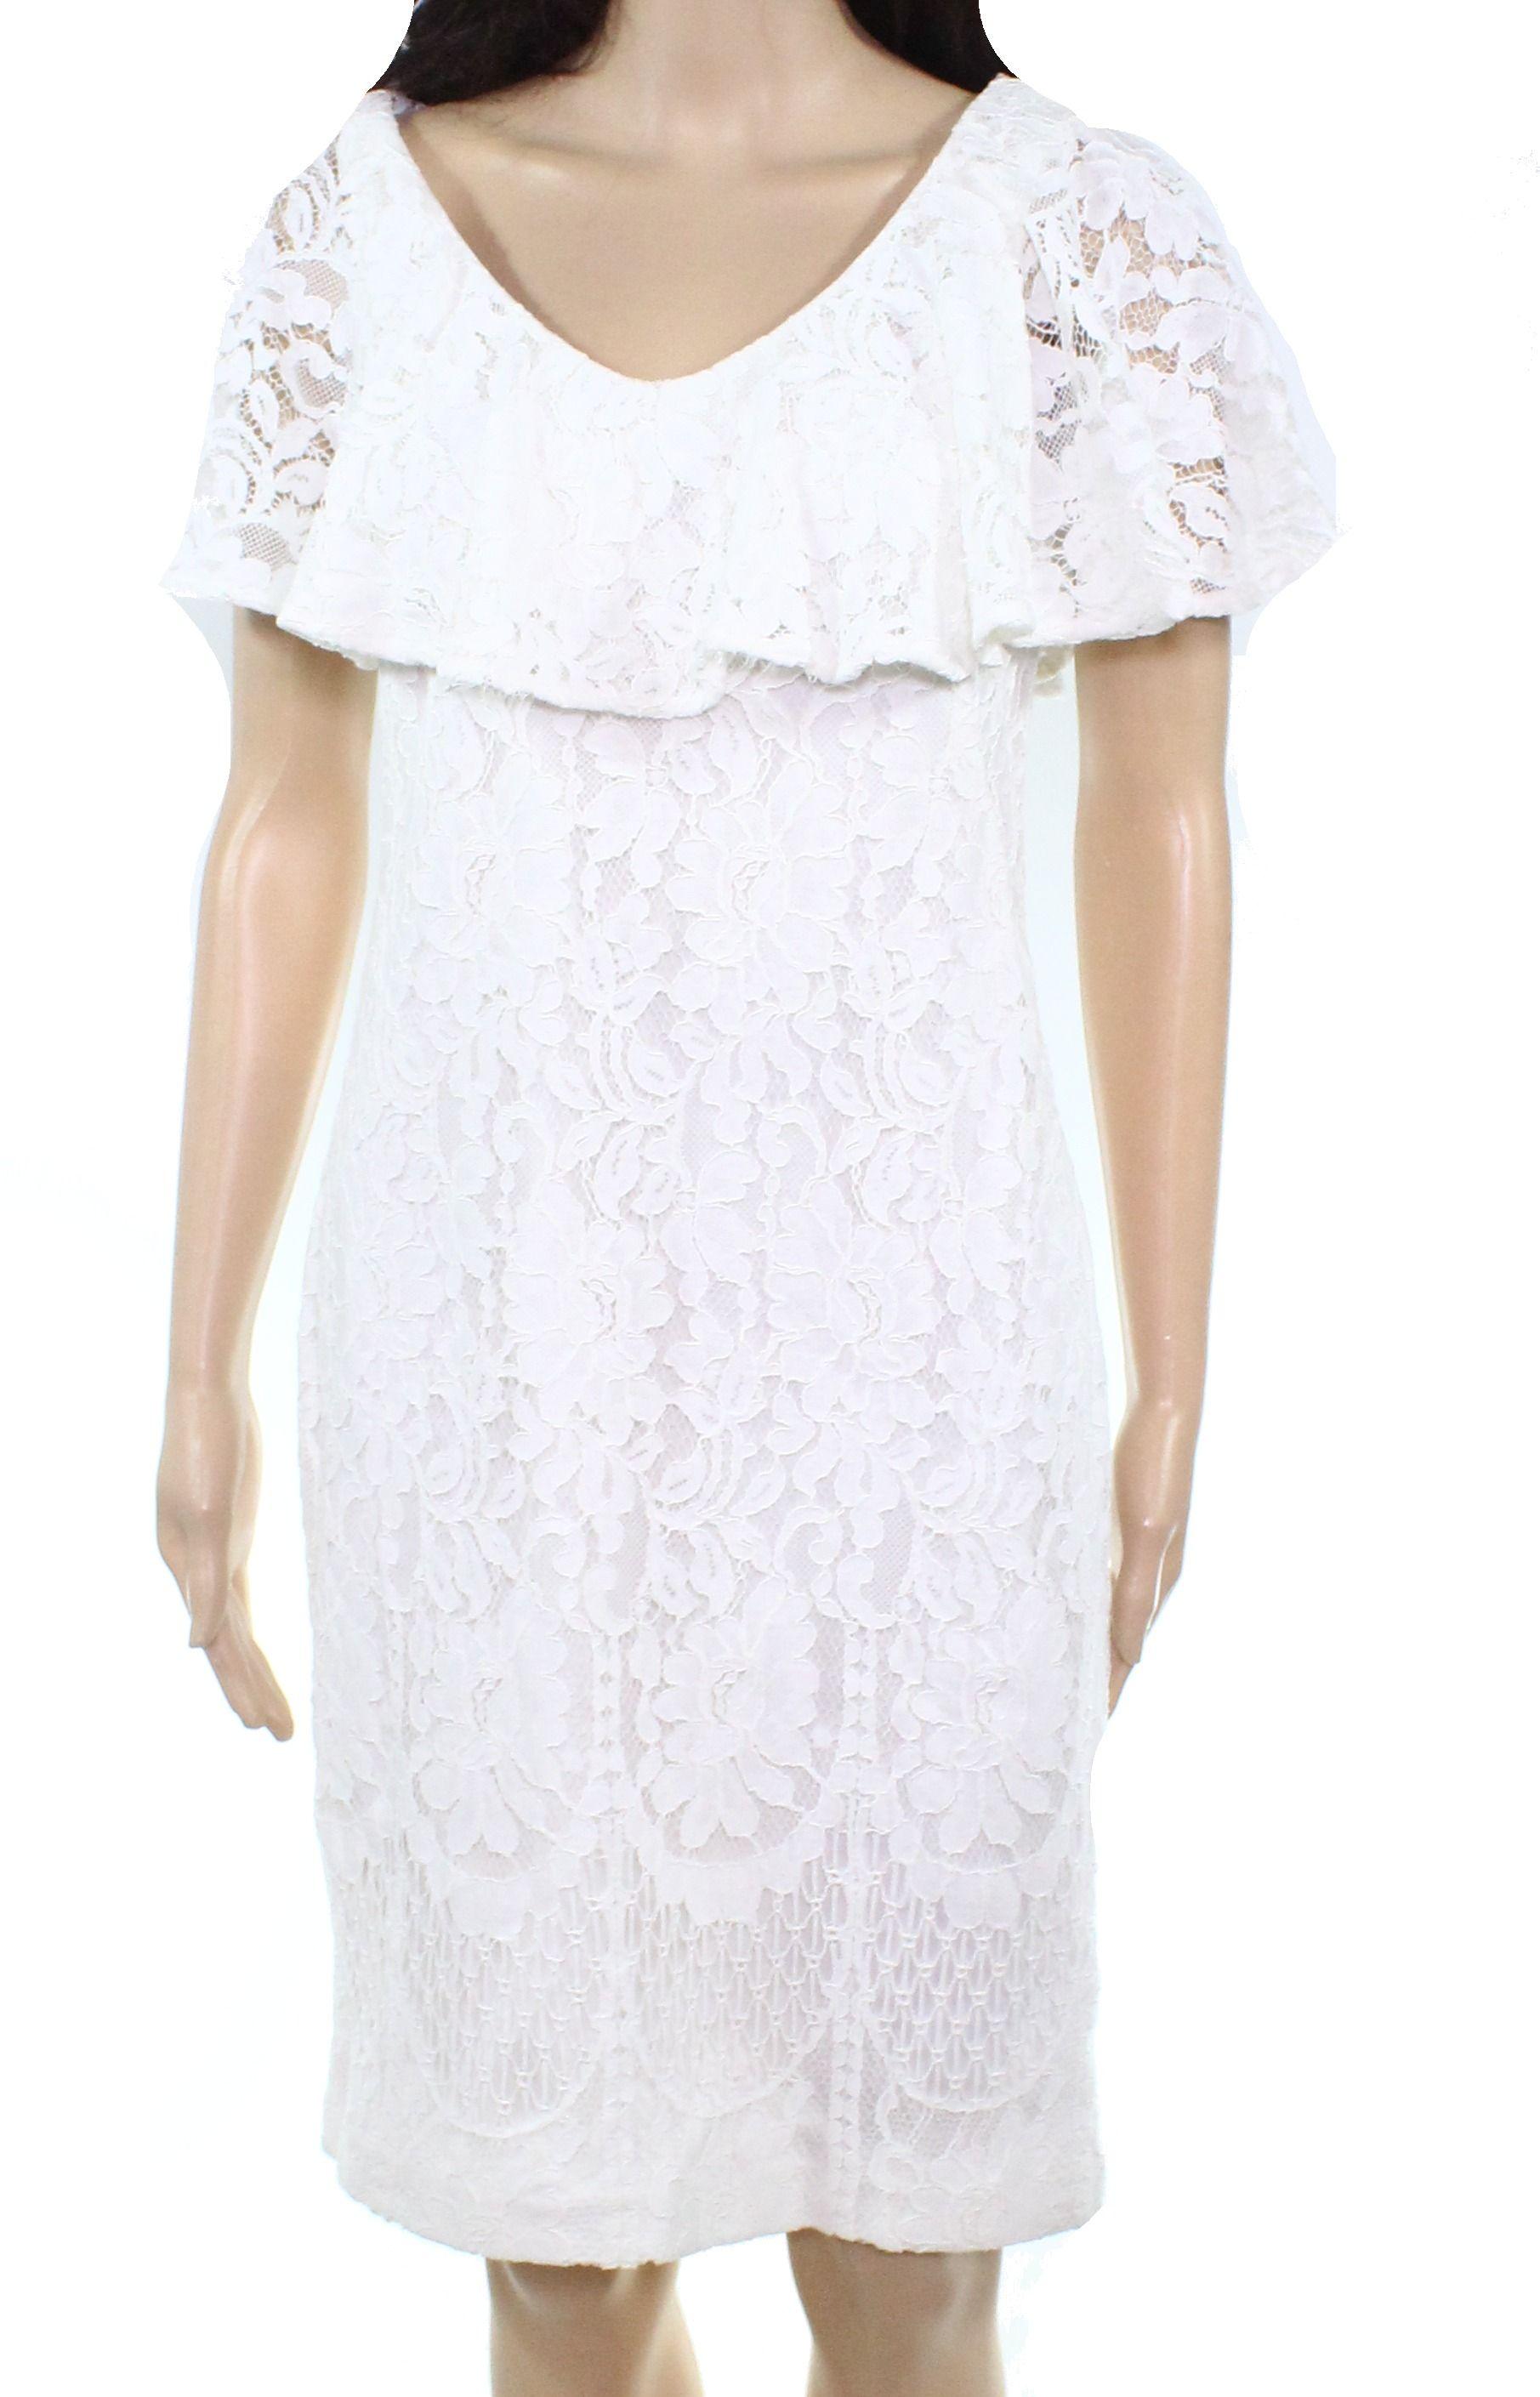 Lauren By Ralph Lauren Women's Sheath Dress White Size 0 Tamalira Lace